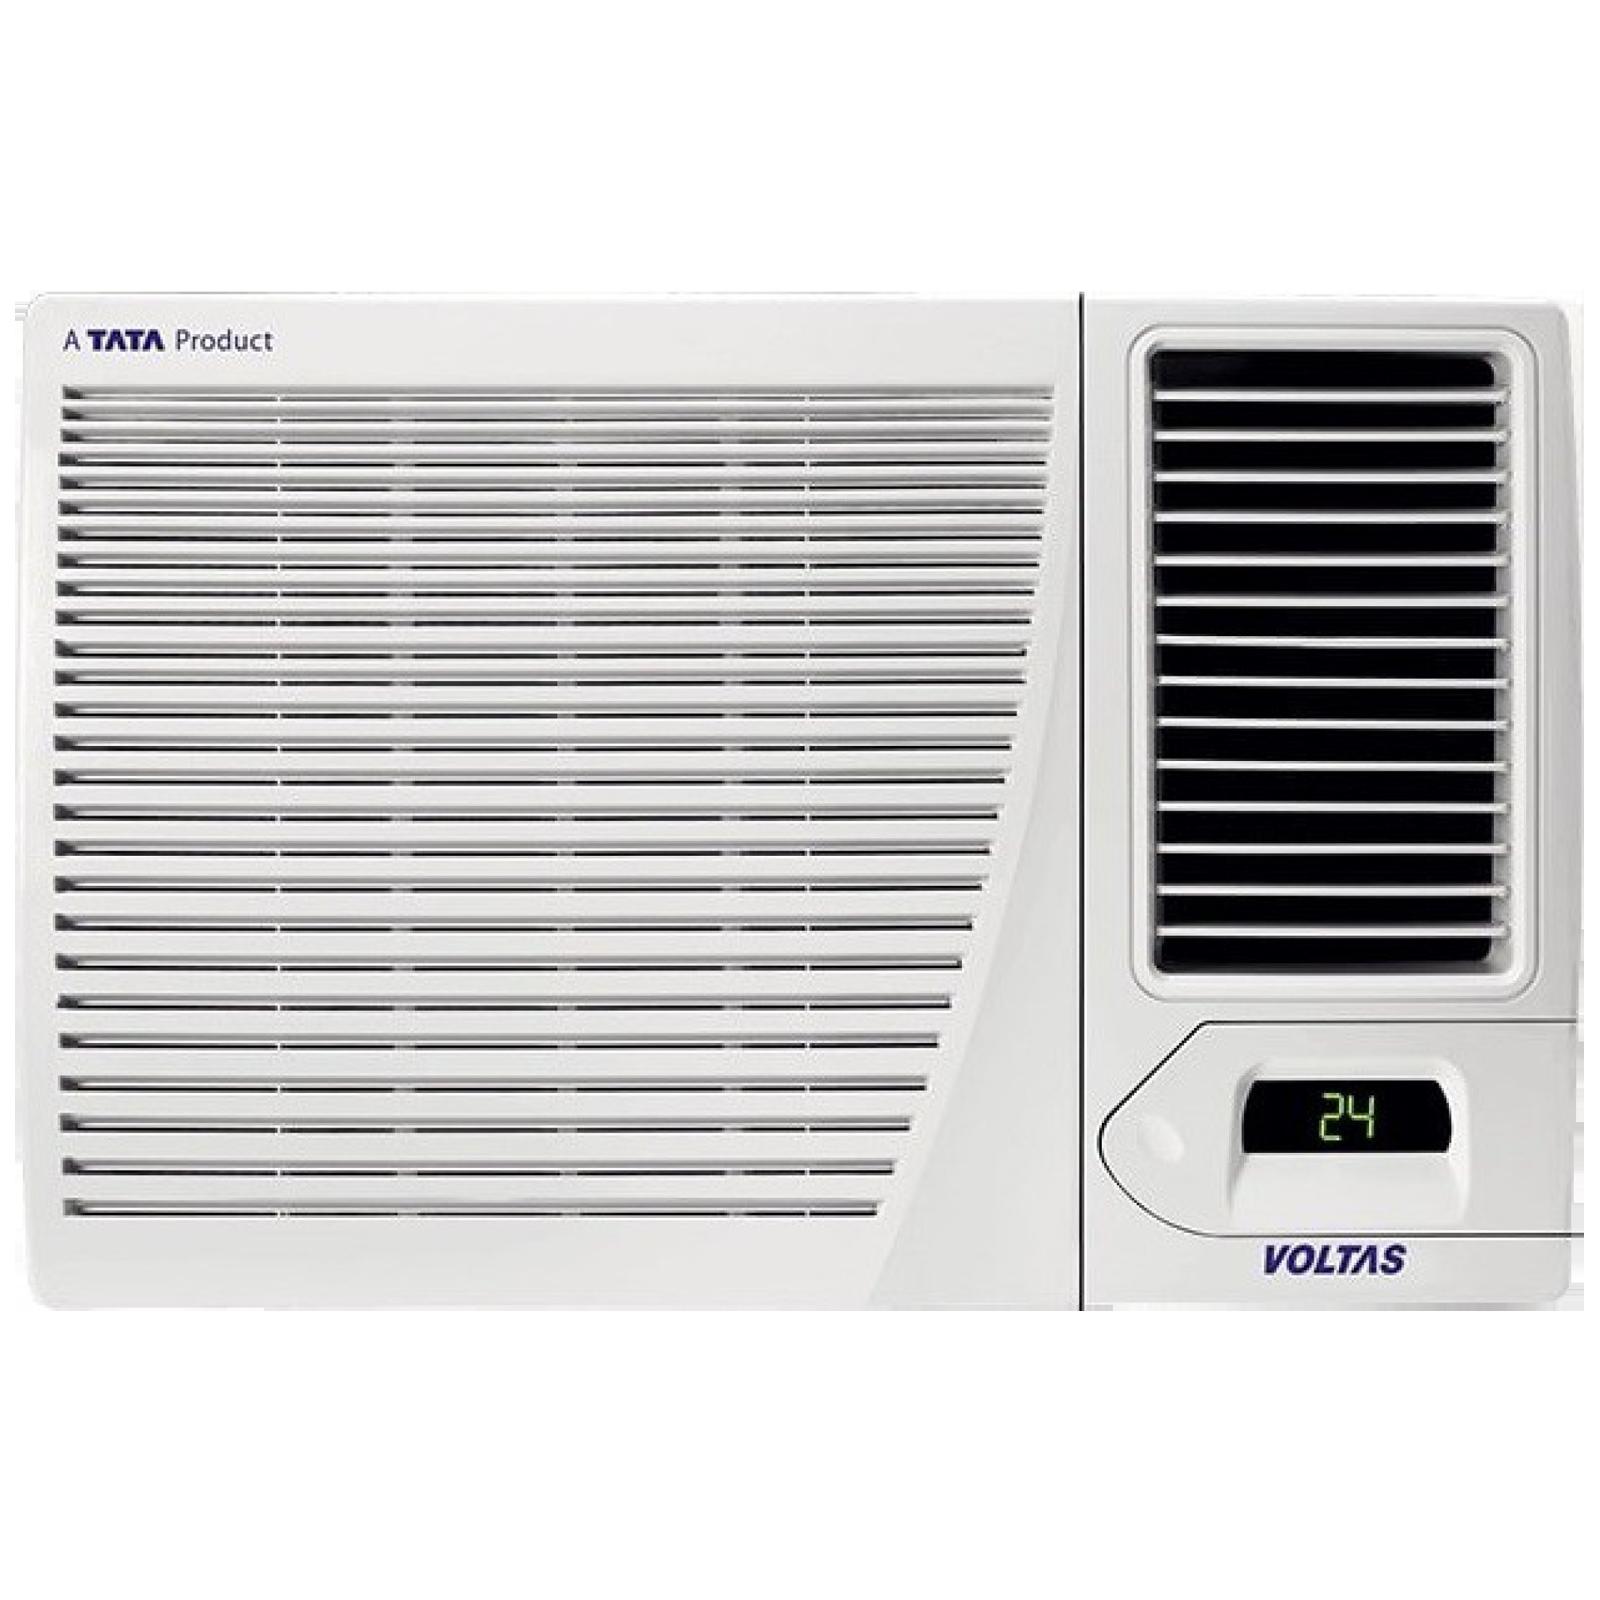 Voltas 1.5 Ton 3 Star Inverter Window AC (Hot and Cold, Copper Condenser, 18H CZP, White)_1